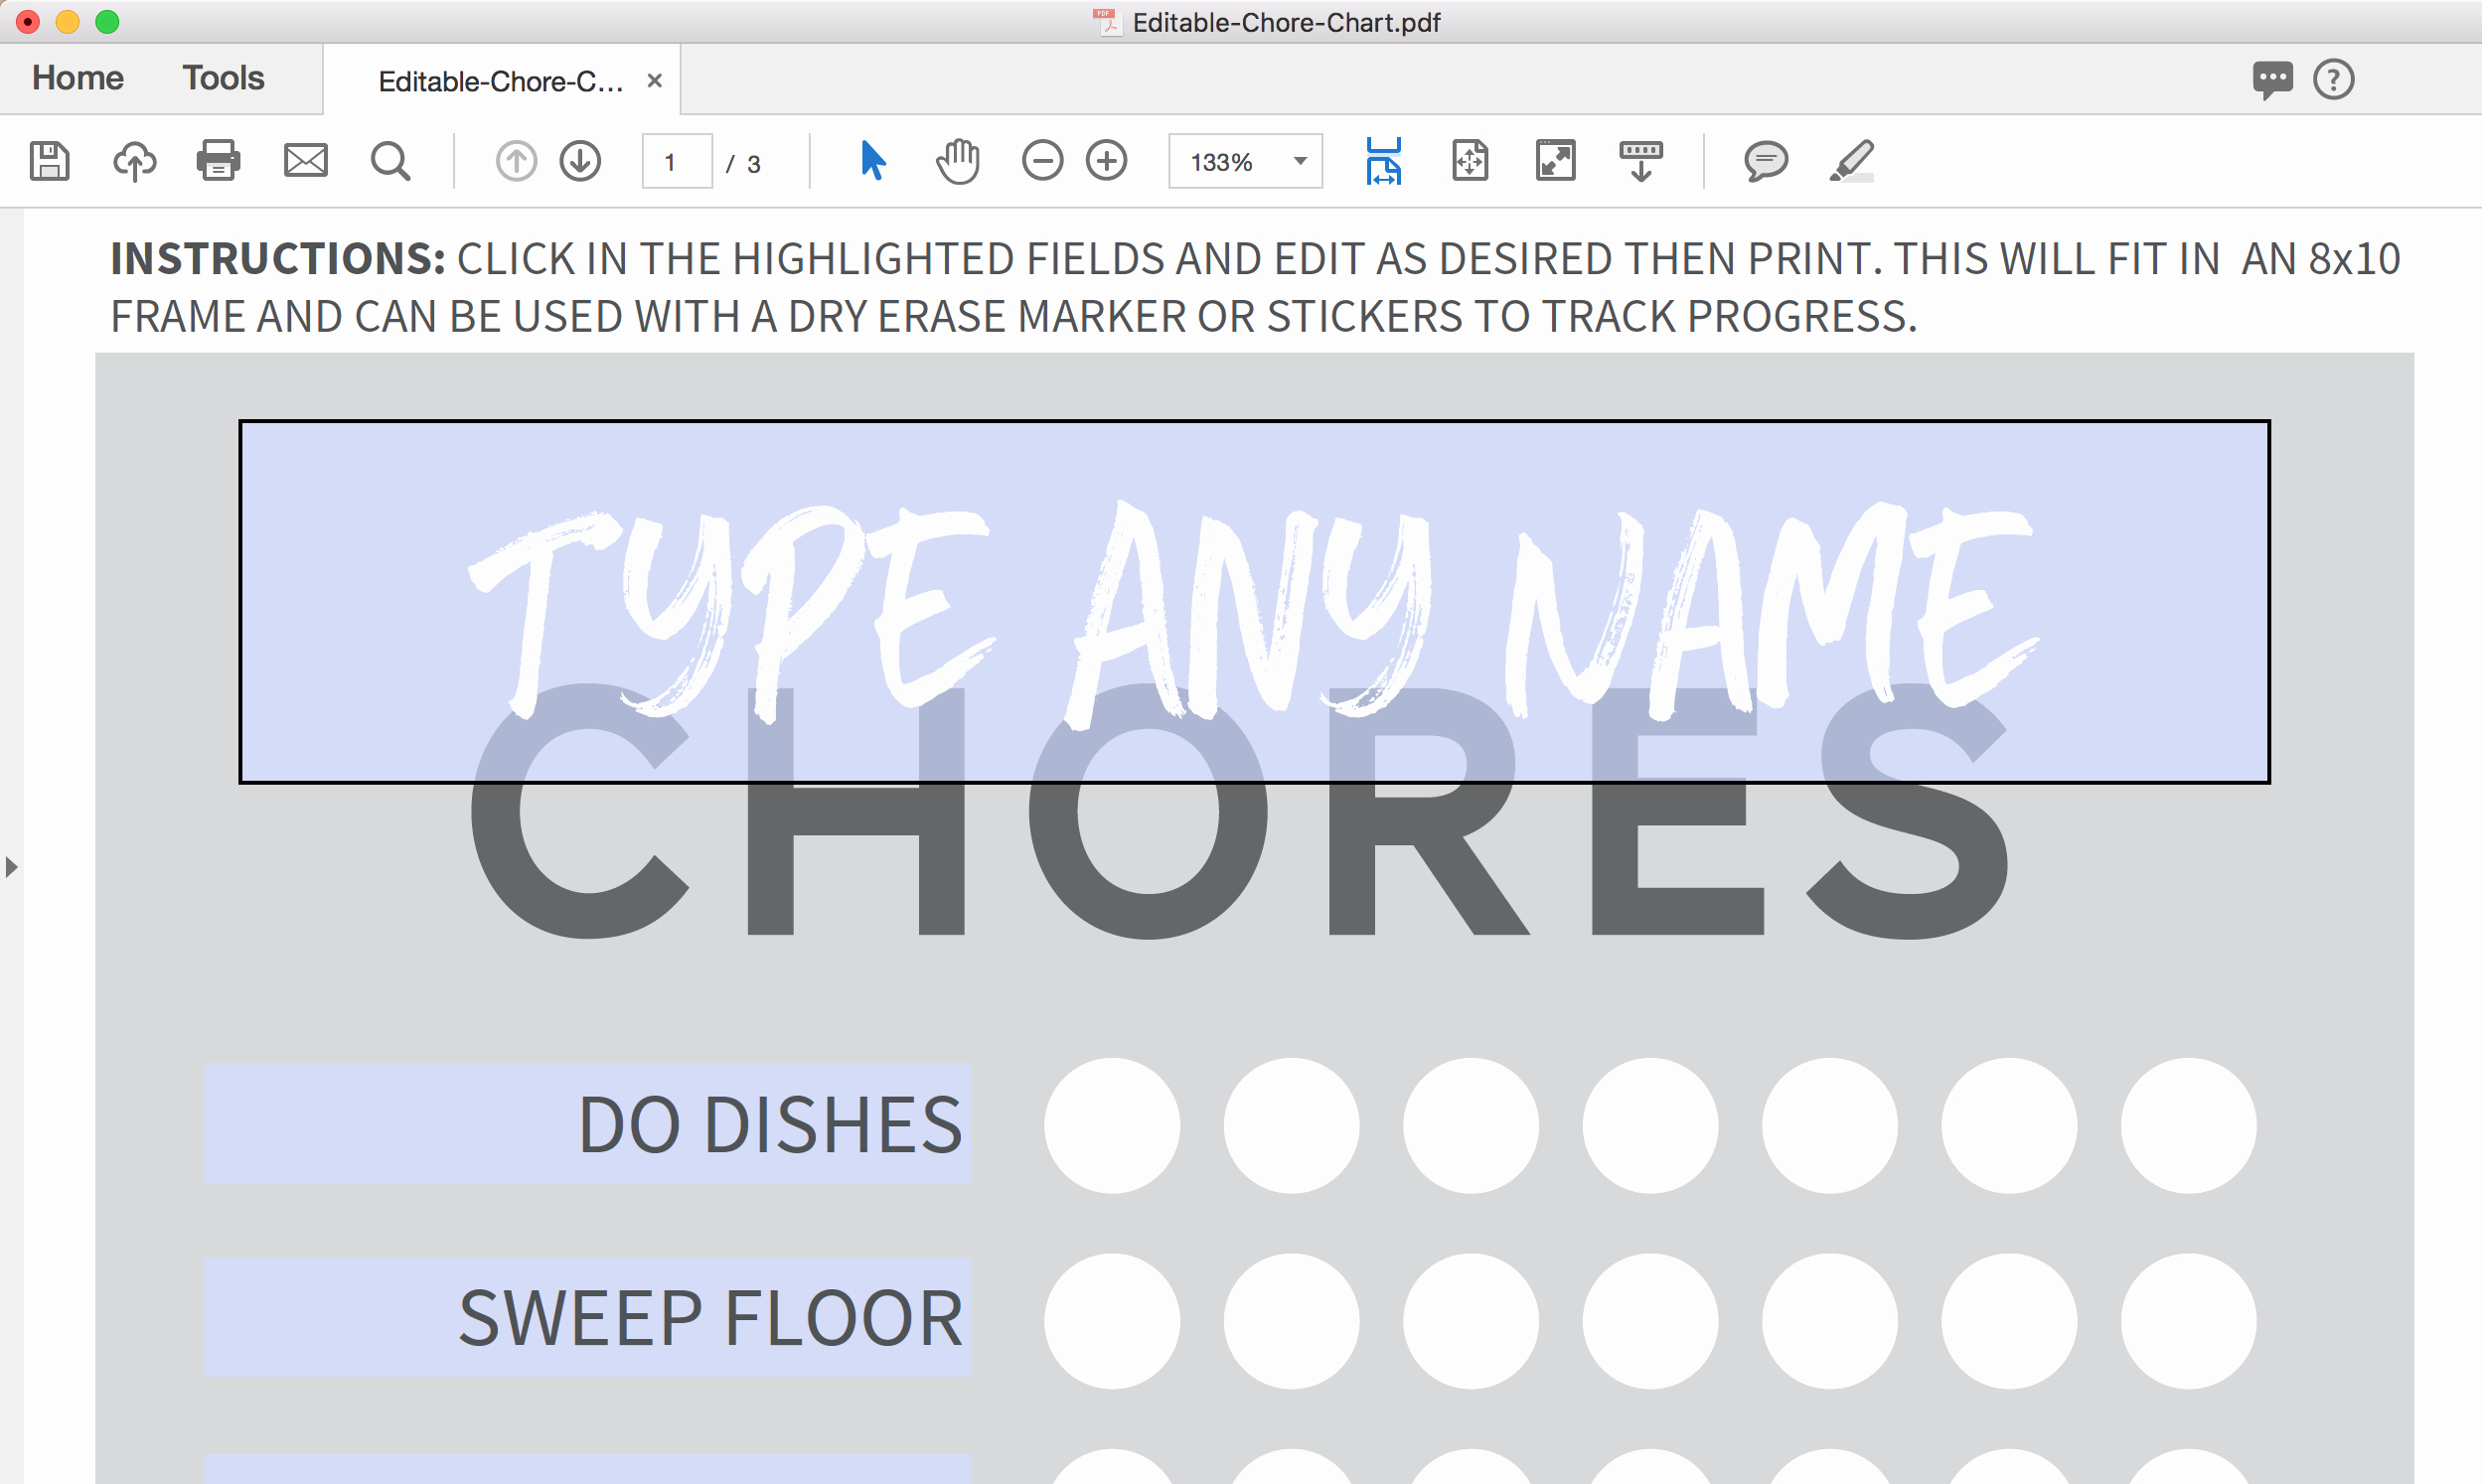 Free Editable Printable Chore Charts Unique Editable & Free Printable Chore Chart Paging Supermom